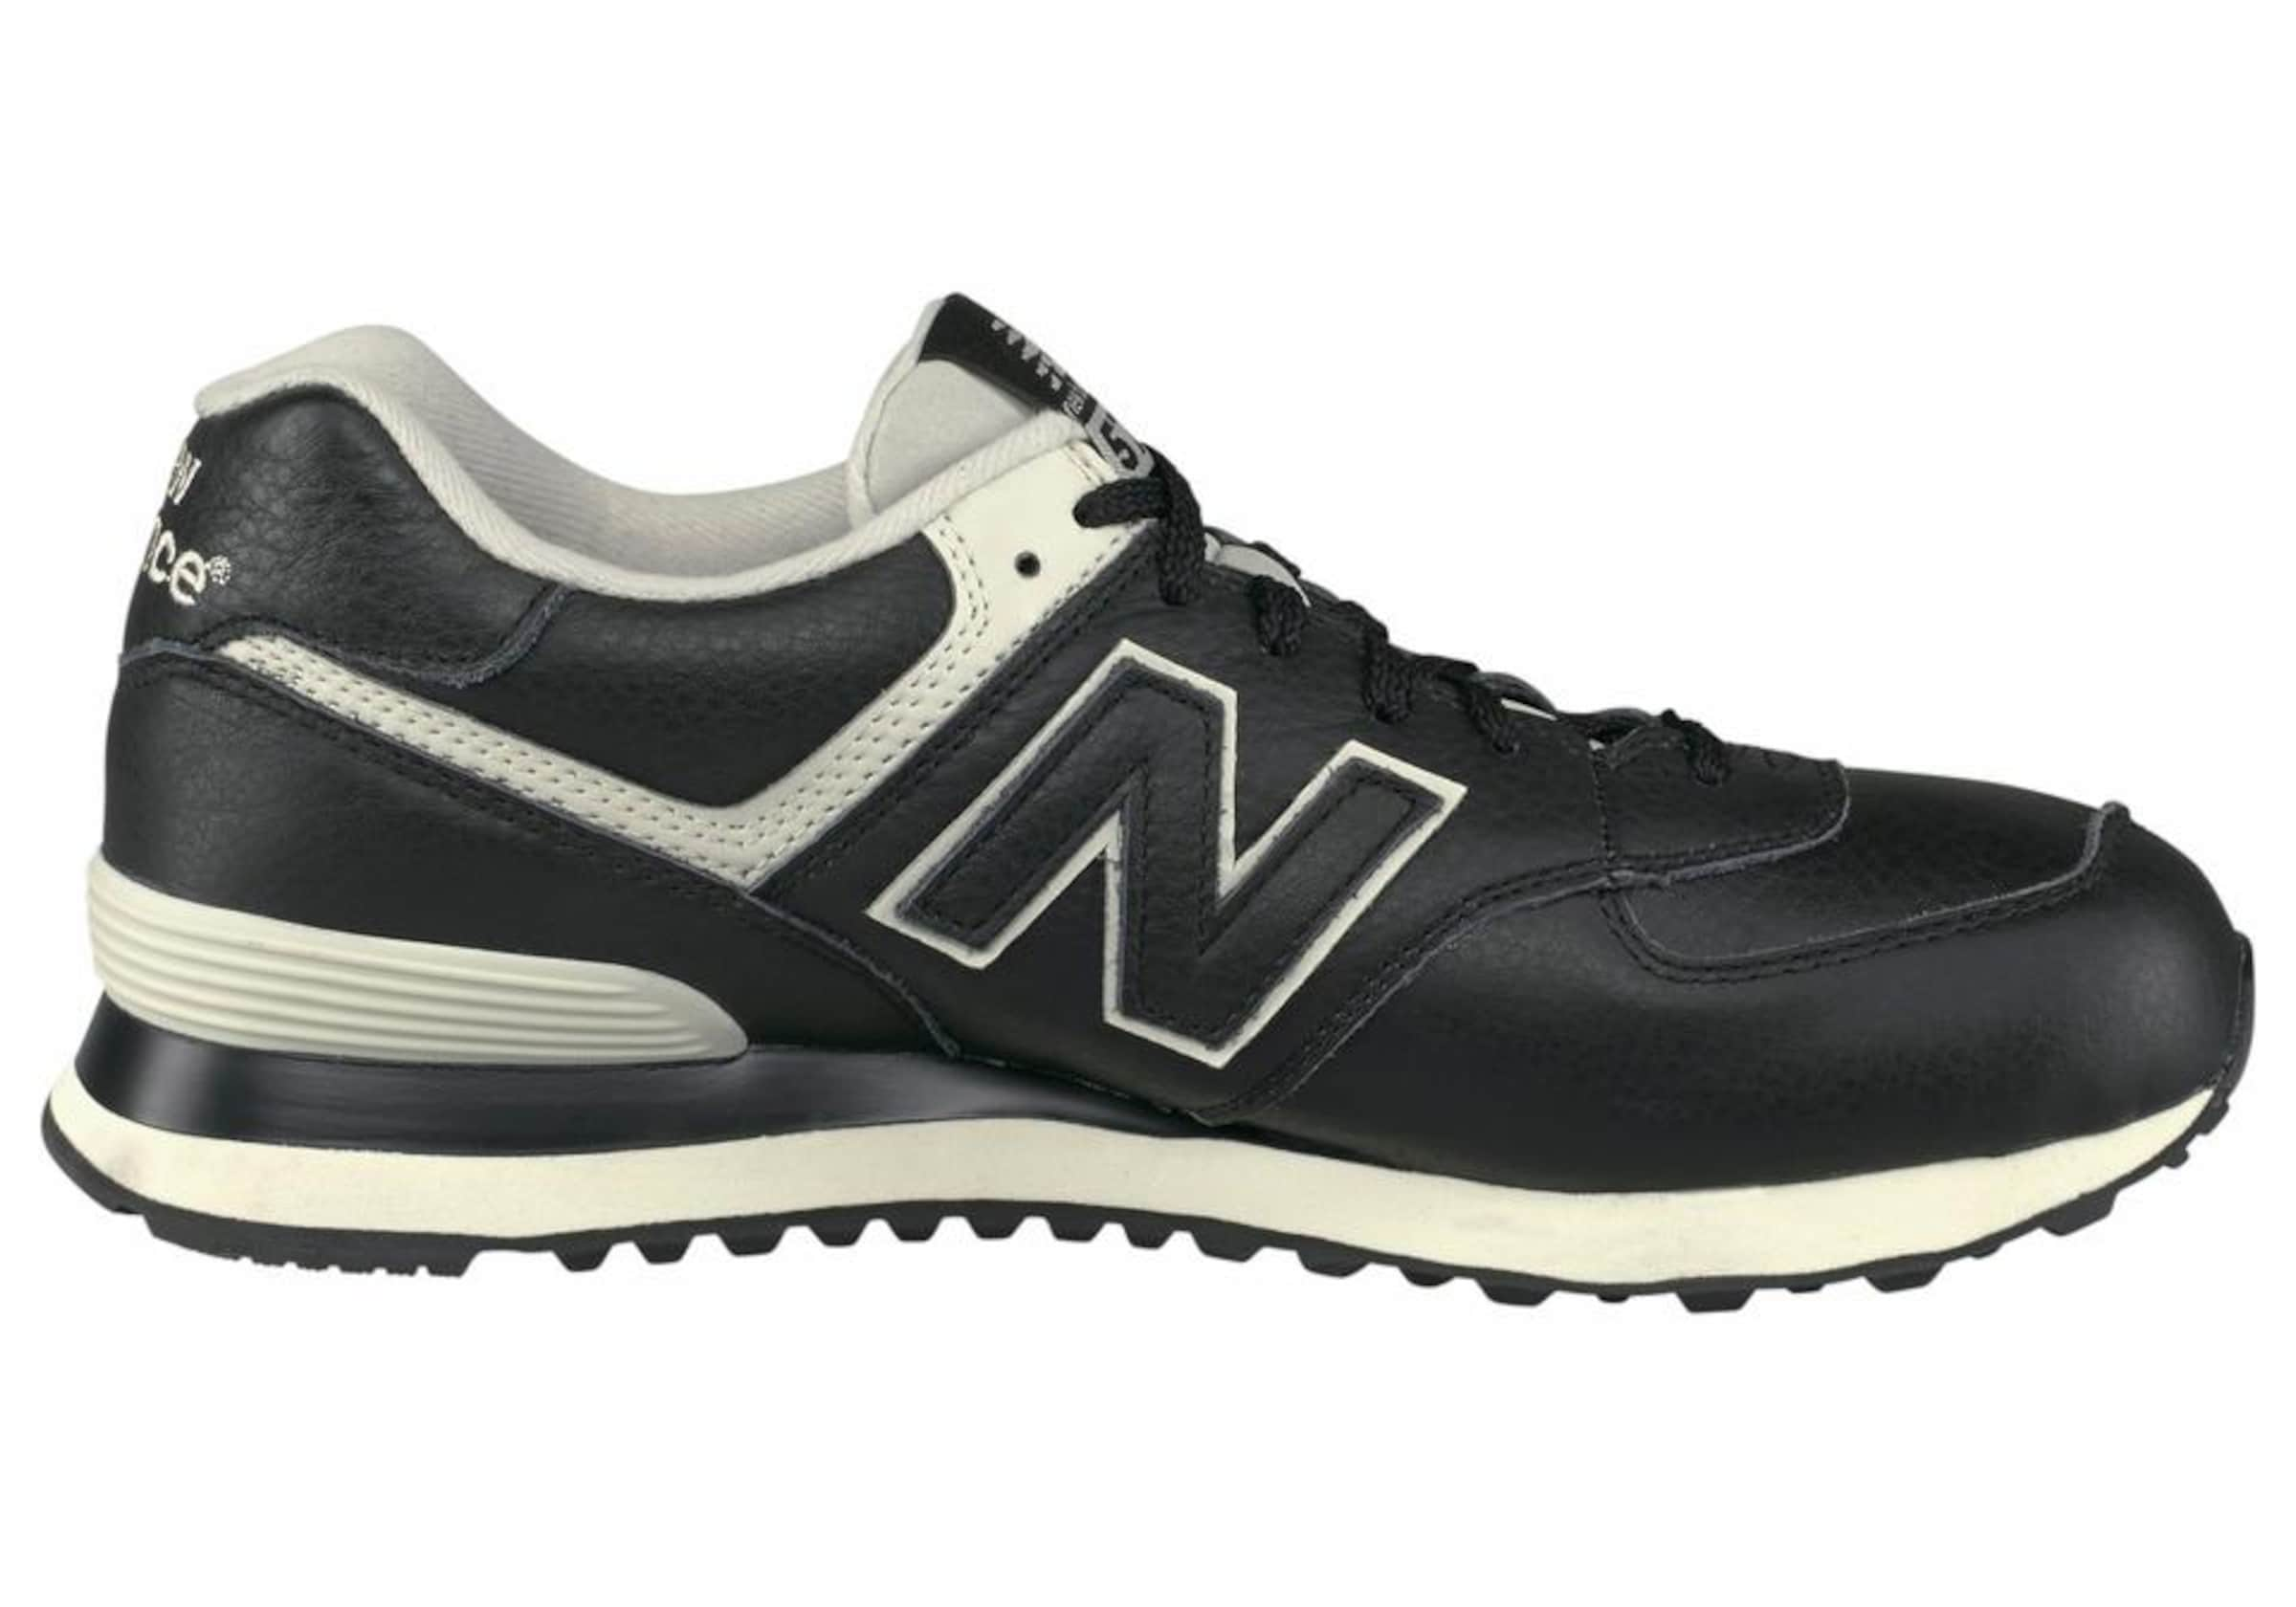 new balance Sneaker 'ML574' Rabatt Modische Steckdose Echte usdxWA8bwf